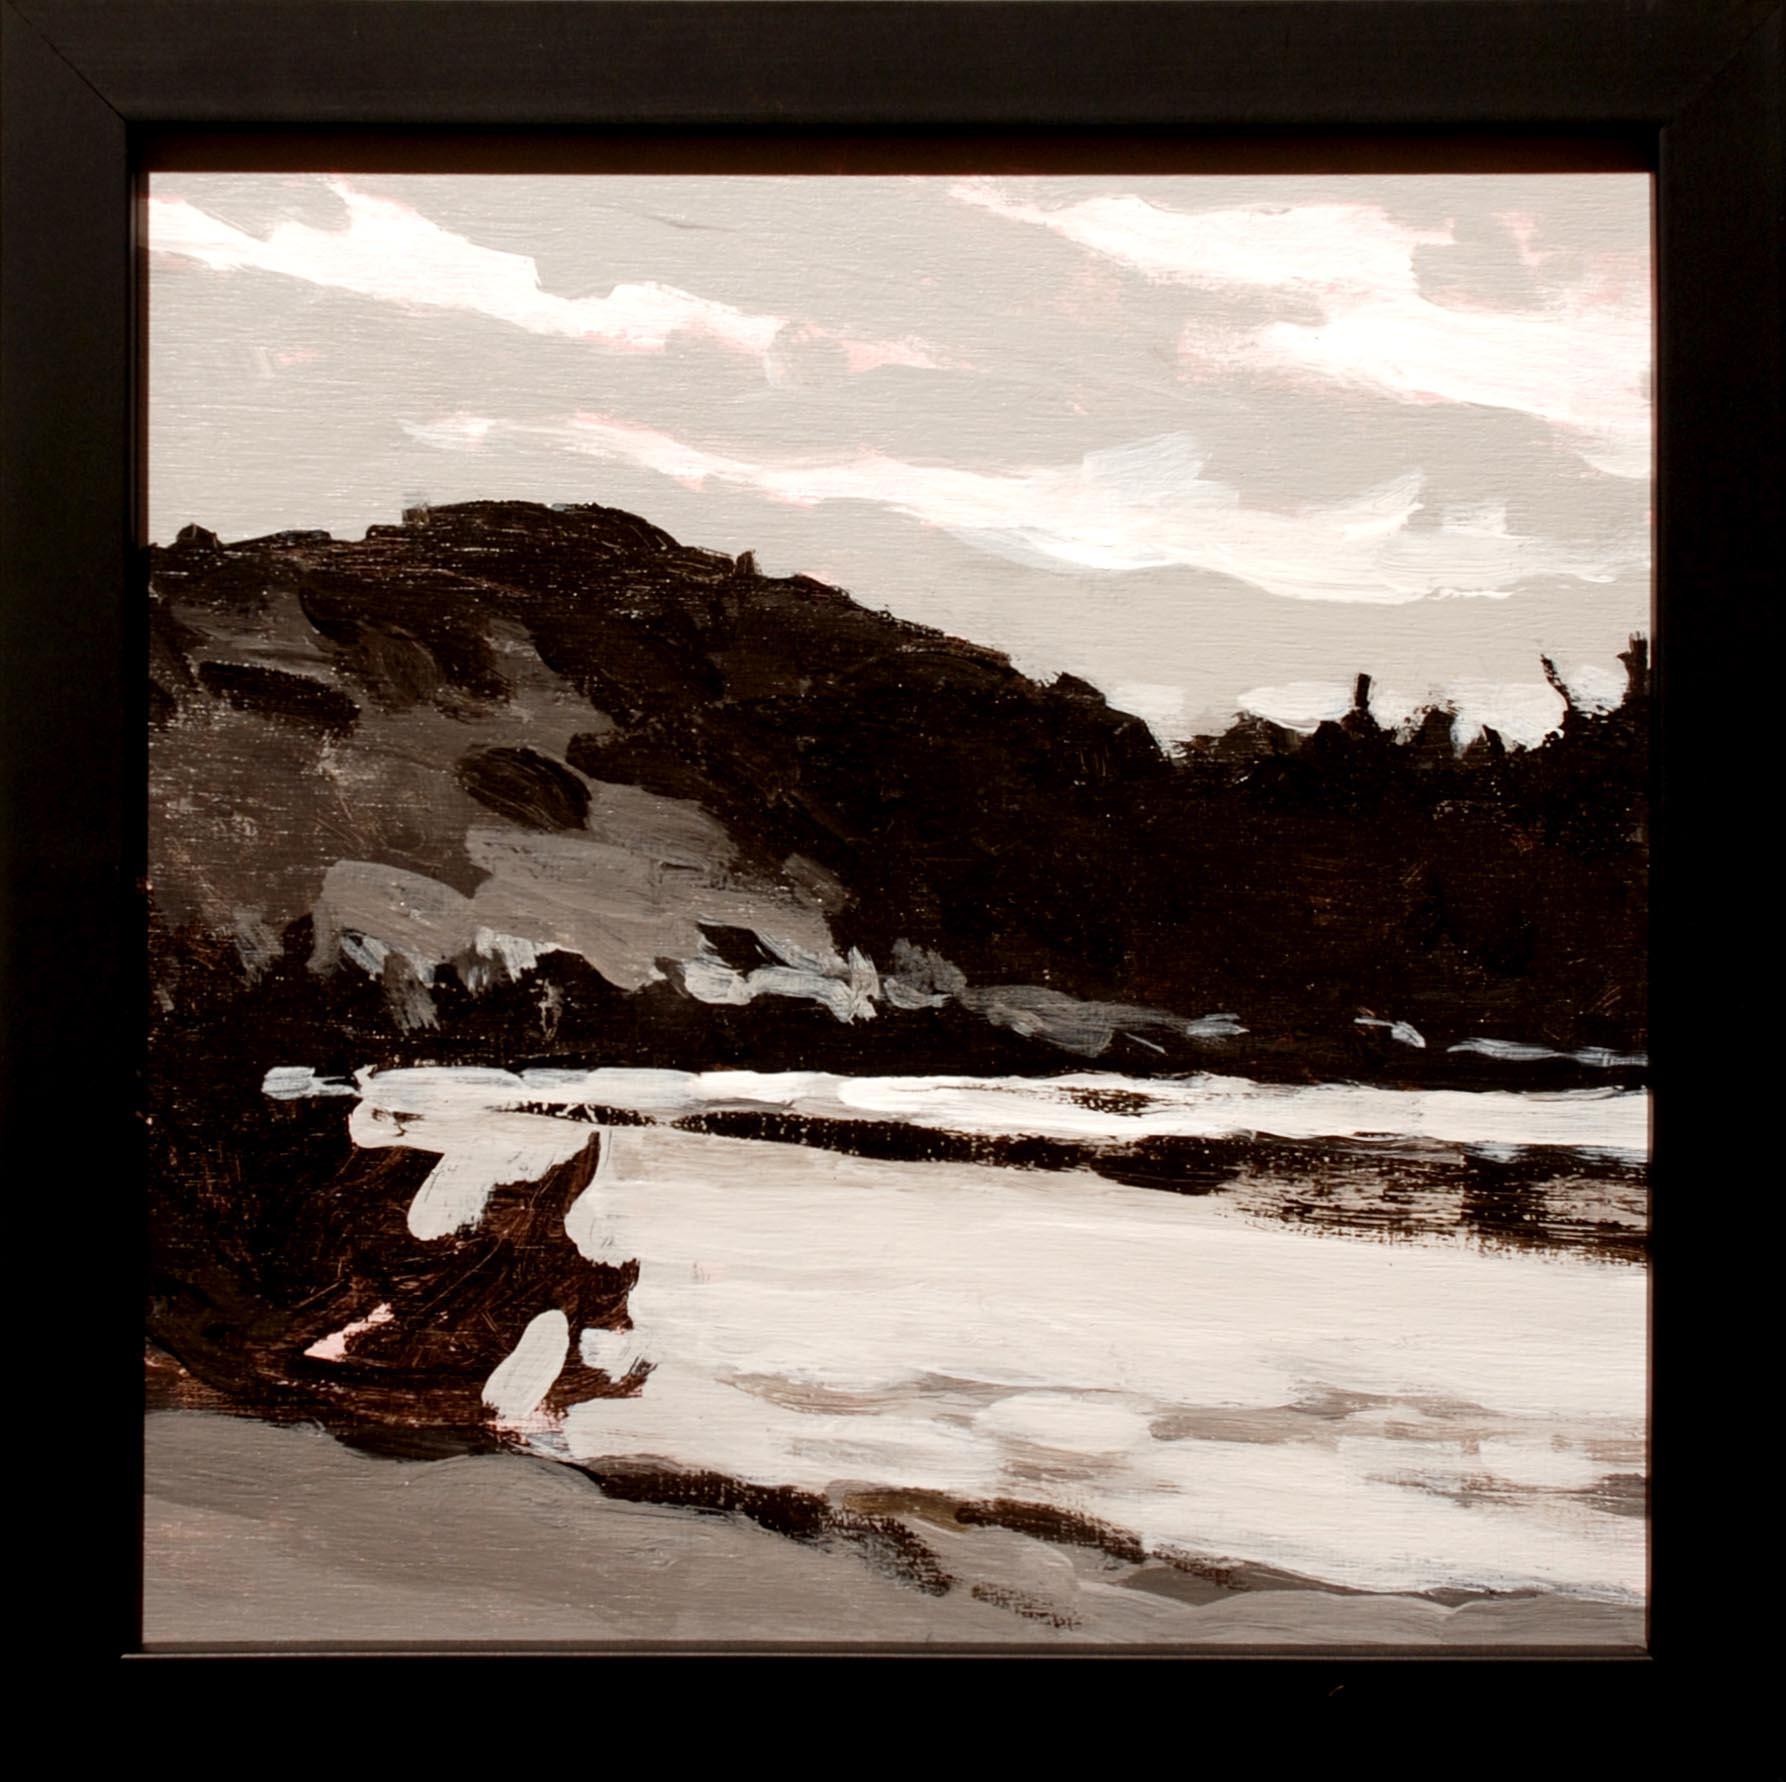 Keith Oehmig Upper Pond, Pierce Pond framed